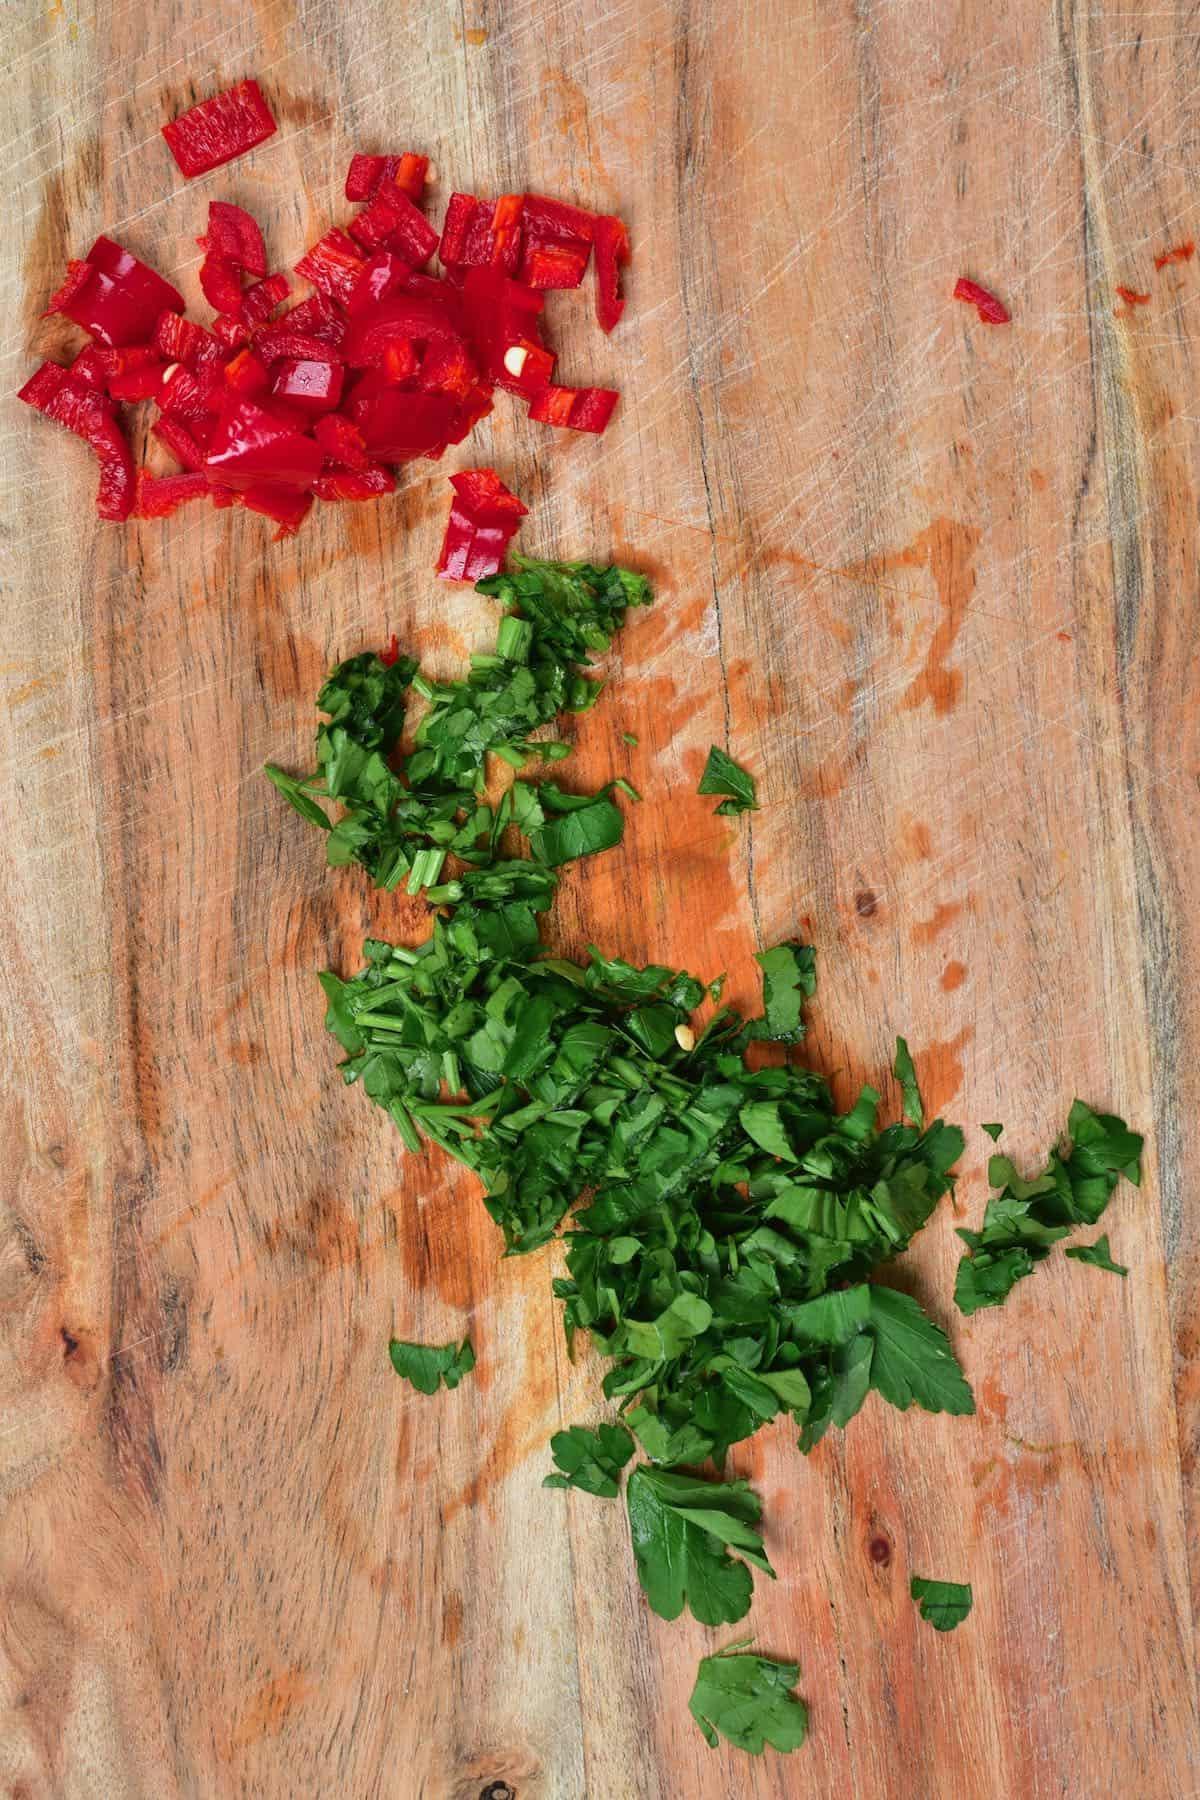 Chopped chili and parsley